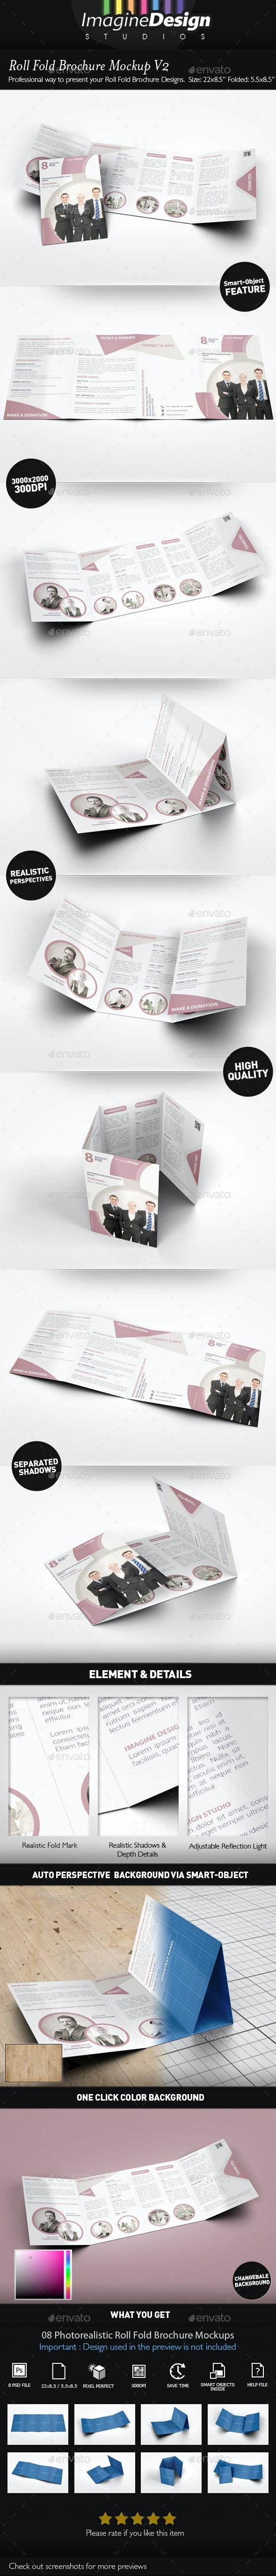 Roll Fold Brochure Mockup V2  - Brochures Print